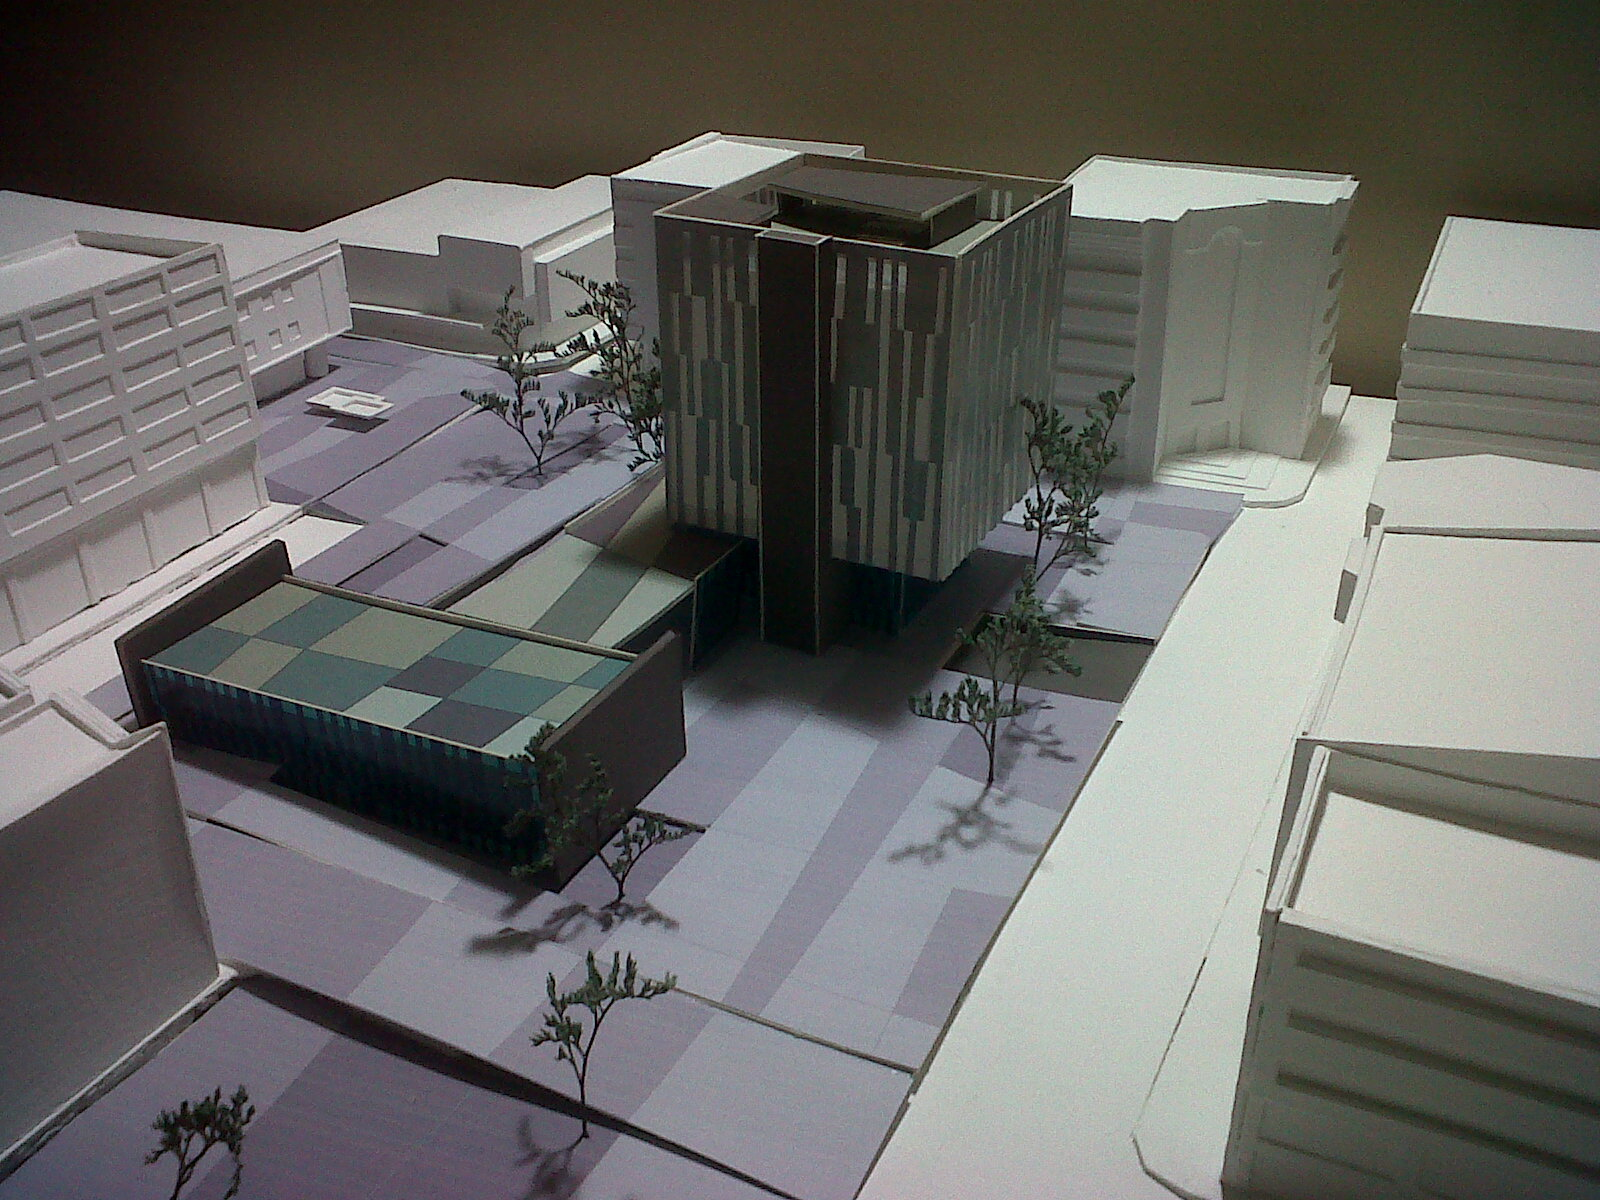 Proyectos arquitectura proyecto centro empresarial y de for Proyectos arquitectura